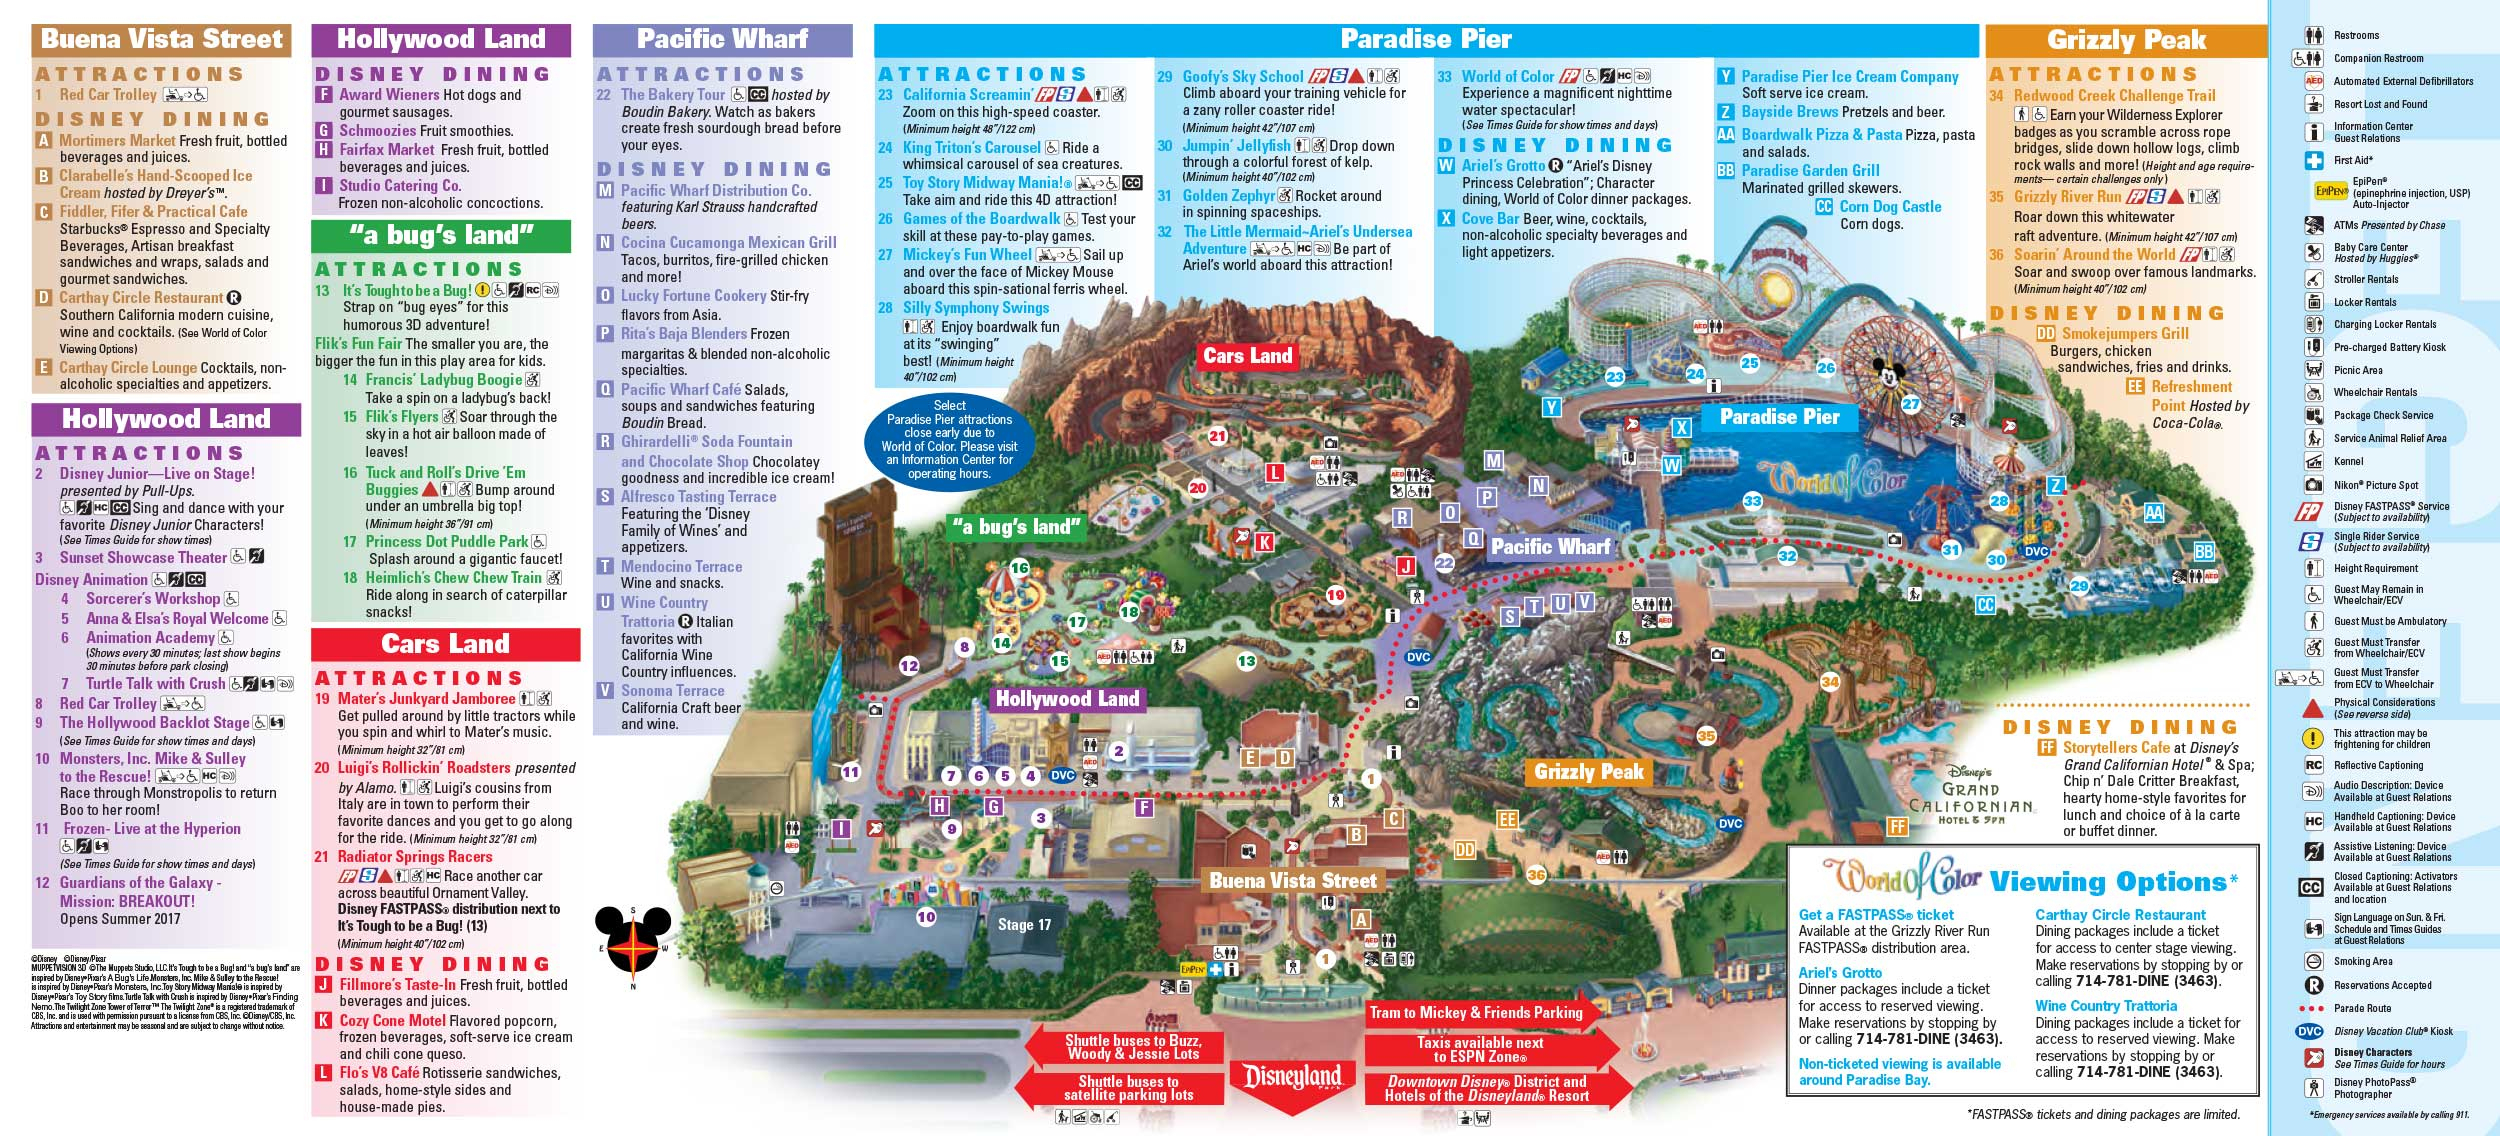 Disneyland Park Map In California, Map Of Disneyland - Printable Disney World Maps 2017